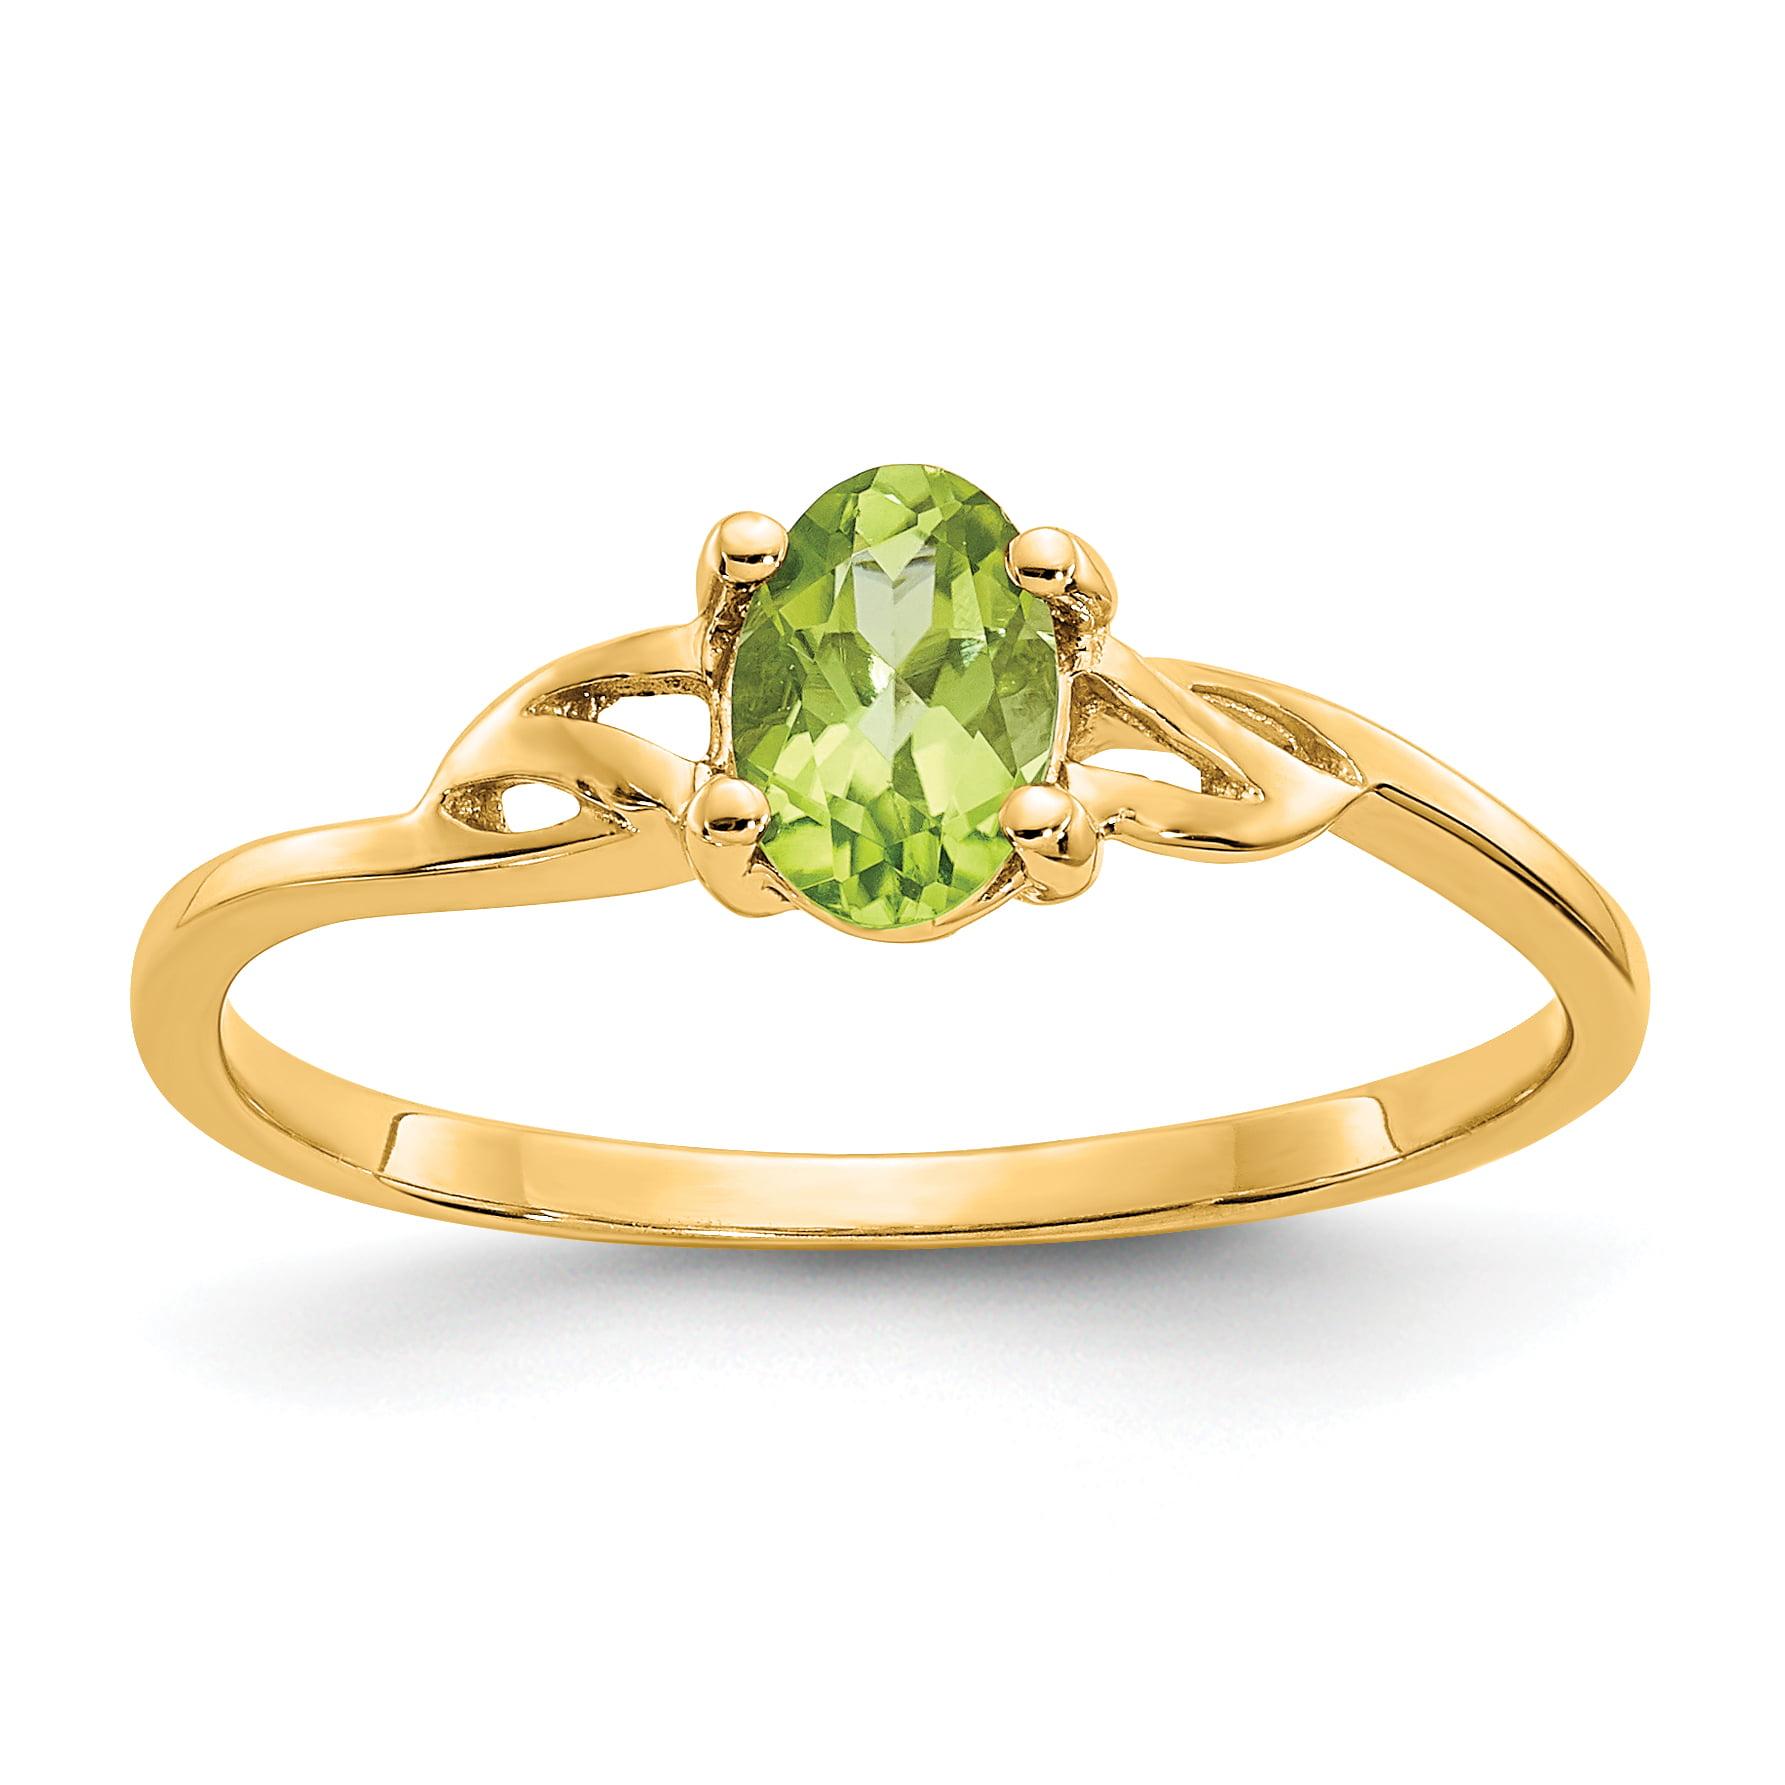 14k Peridot Birthstone Ring by Saris and Things QG